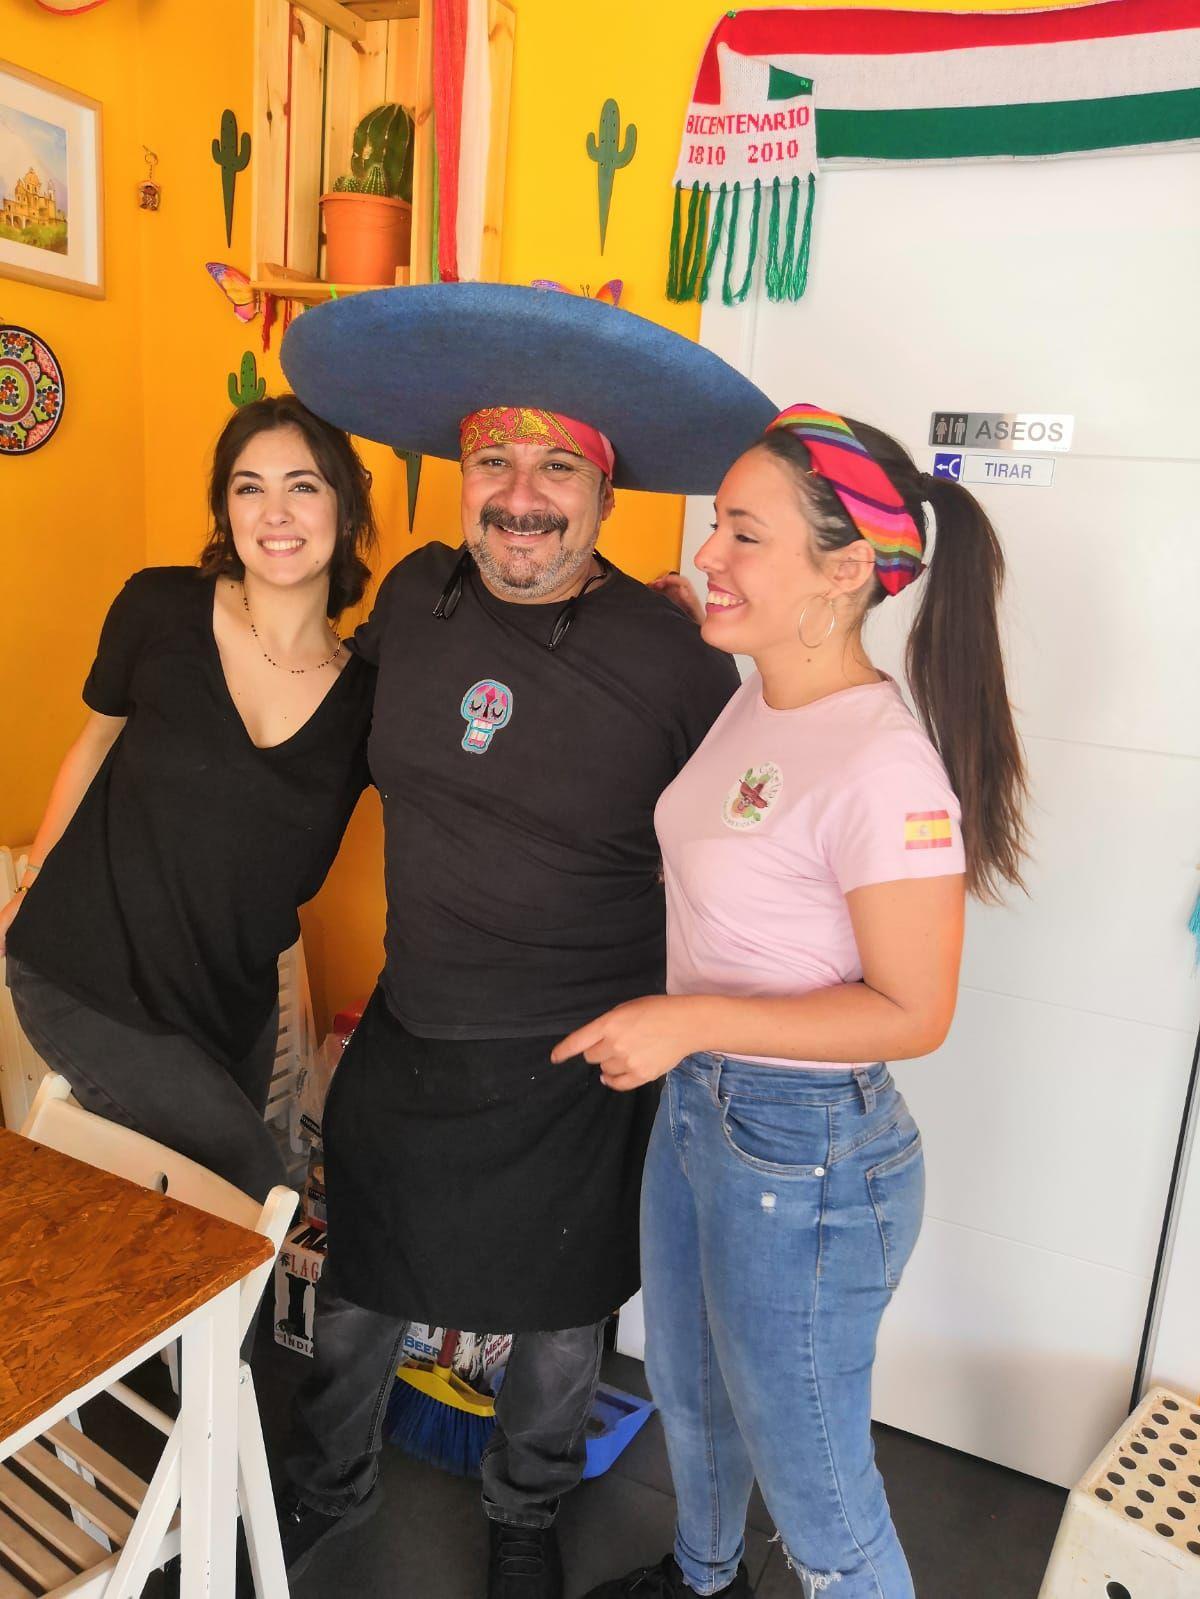 Foto 19 de Restaurante mexicano en  | Cantina La Catrina